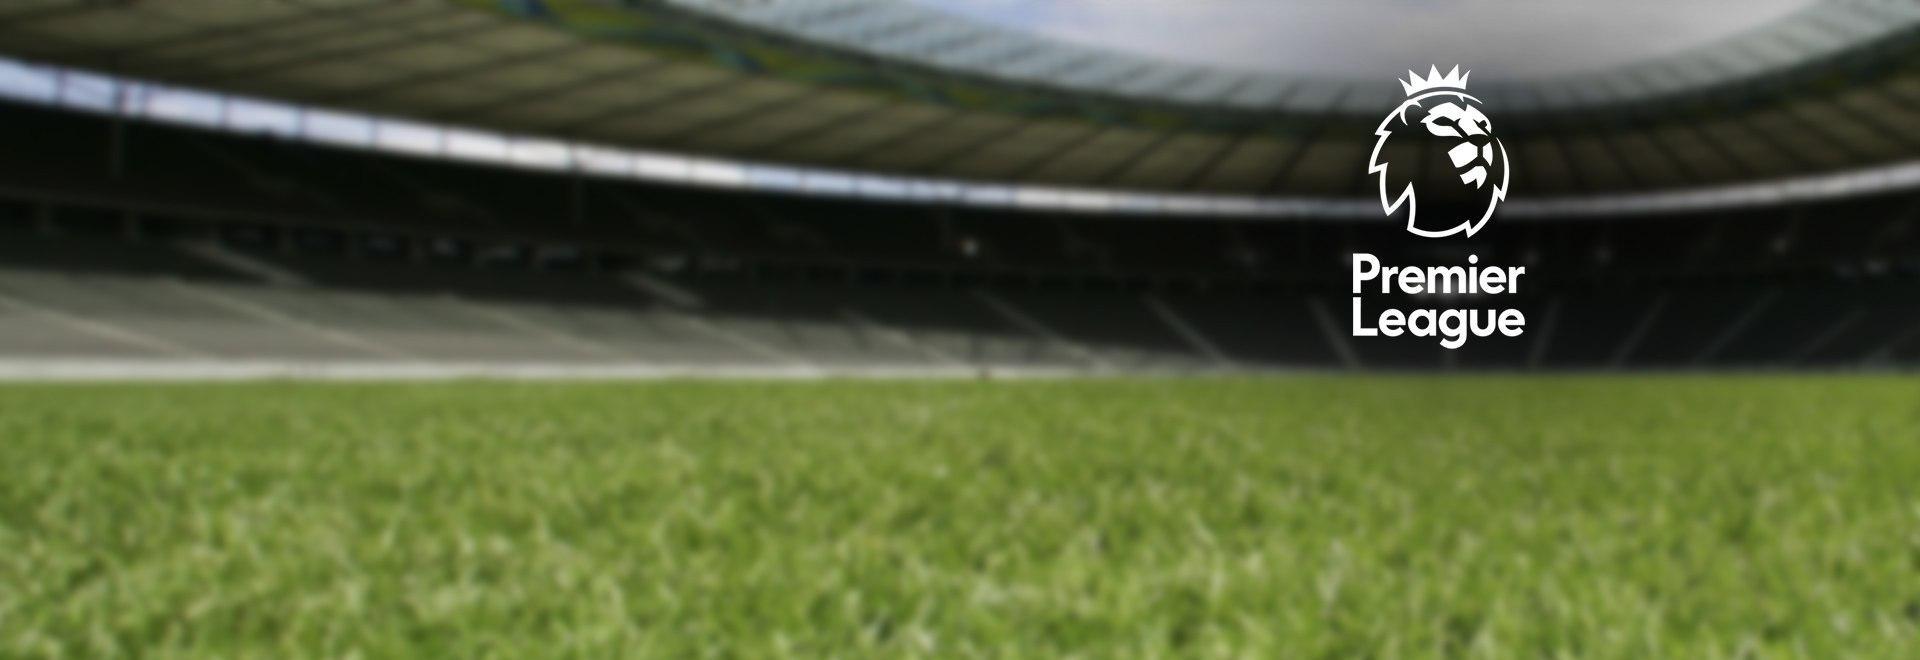 Sheffield United - Tottenham. 19a g.